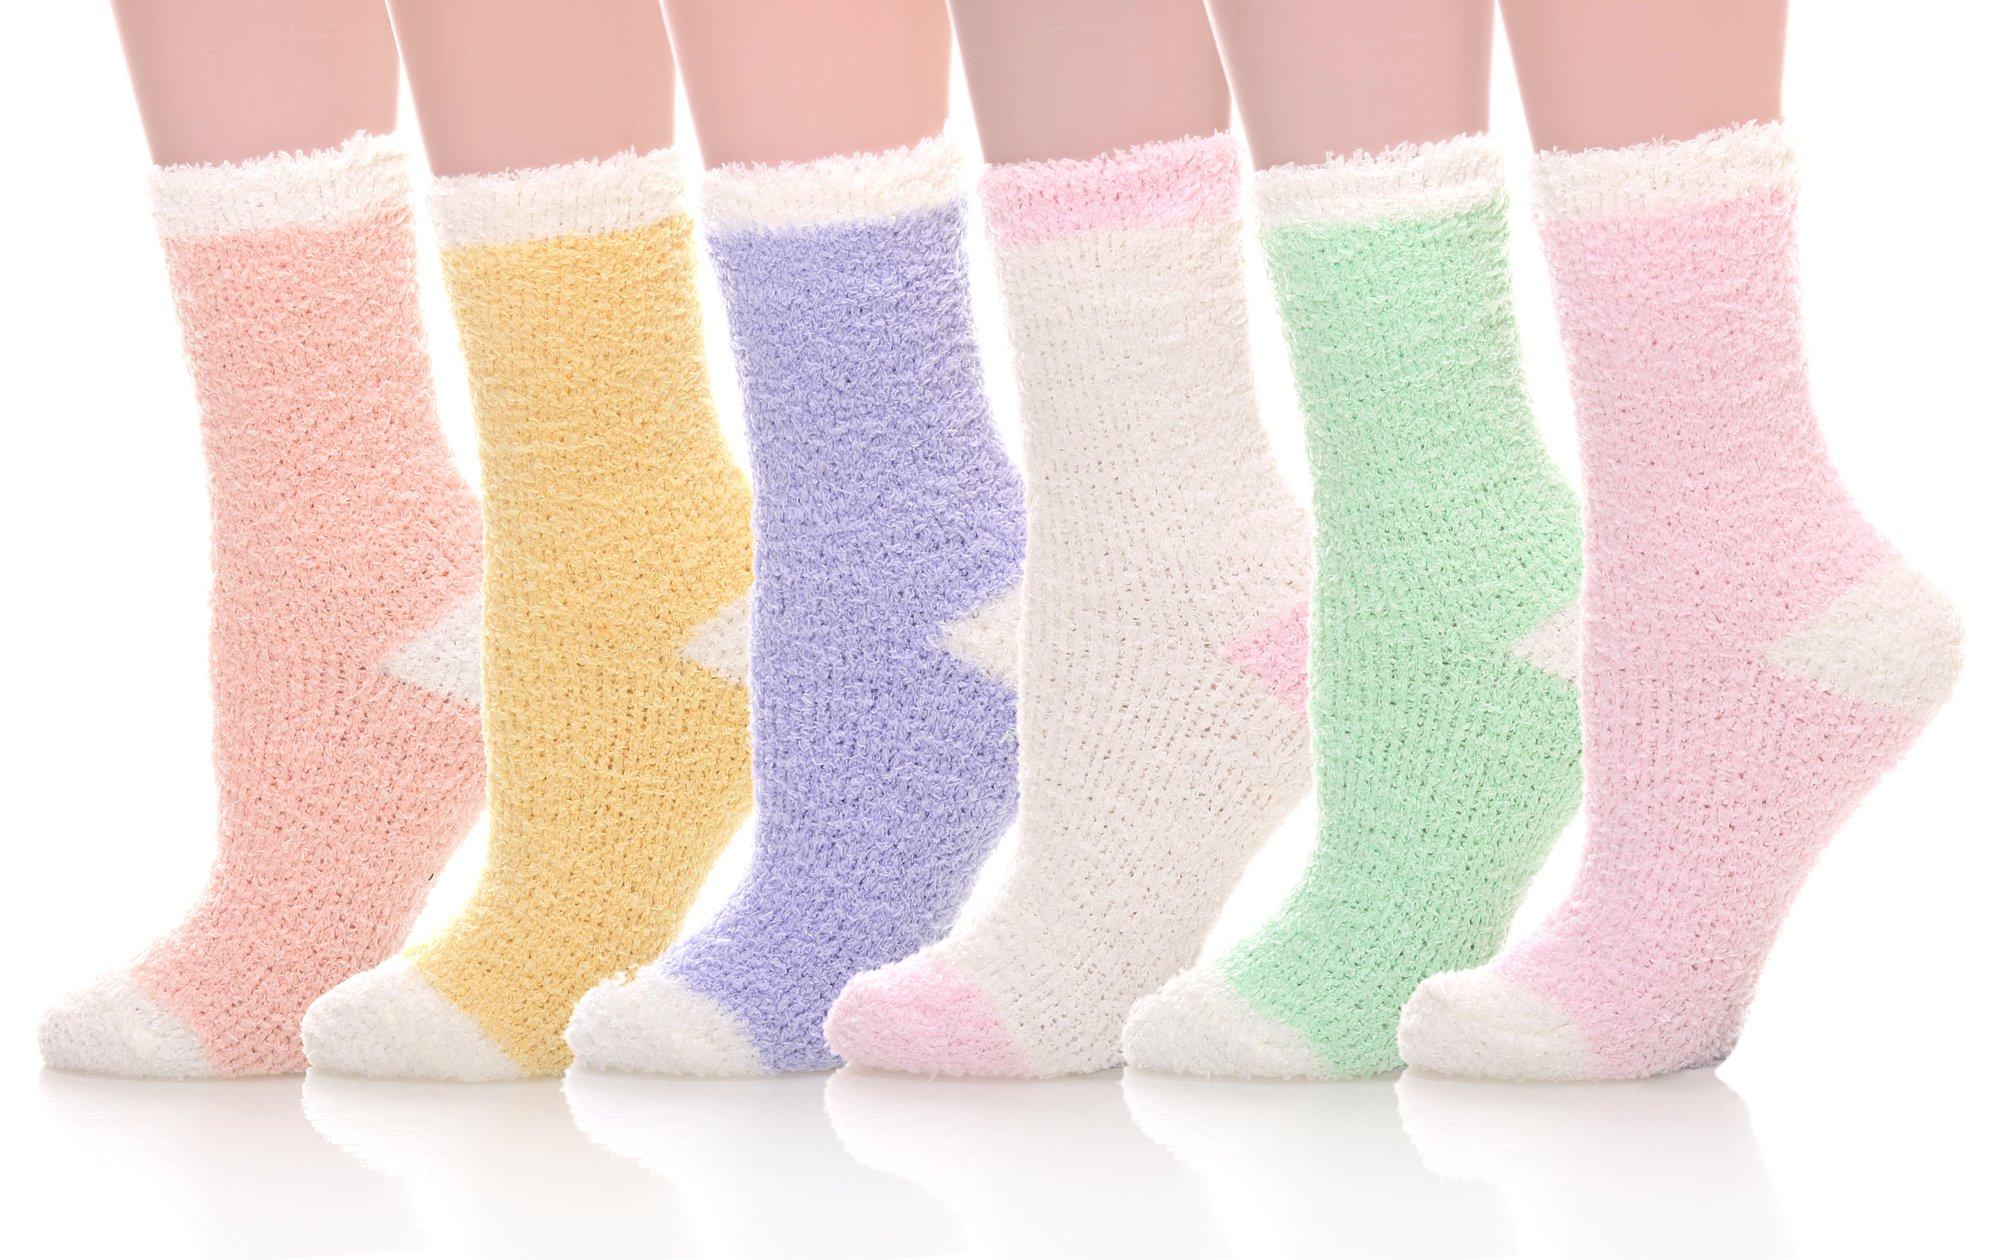 MIUBEE 6 Pack Women Super Soft Warm Microfiber Fuzzy Winter Warm Sleeping Slipper Socks